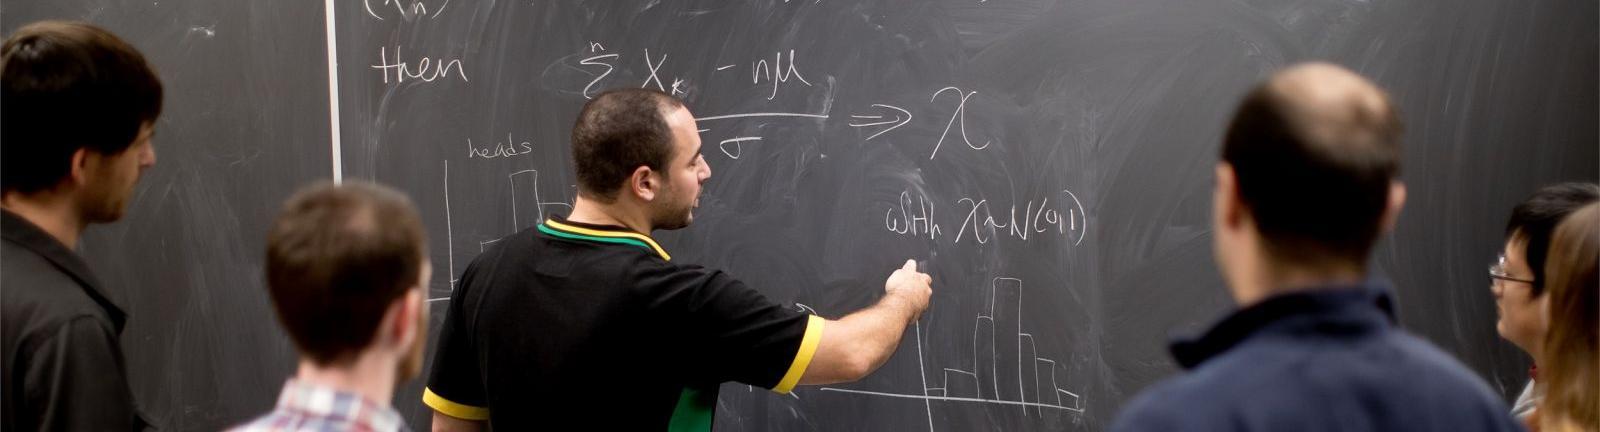 Mathematics professor writing on a chalkboard with students gathered around